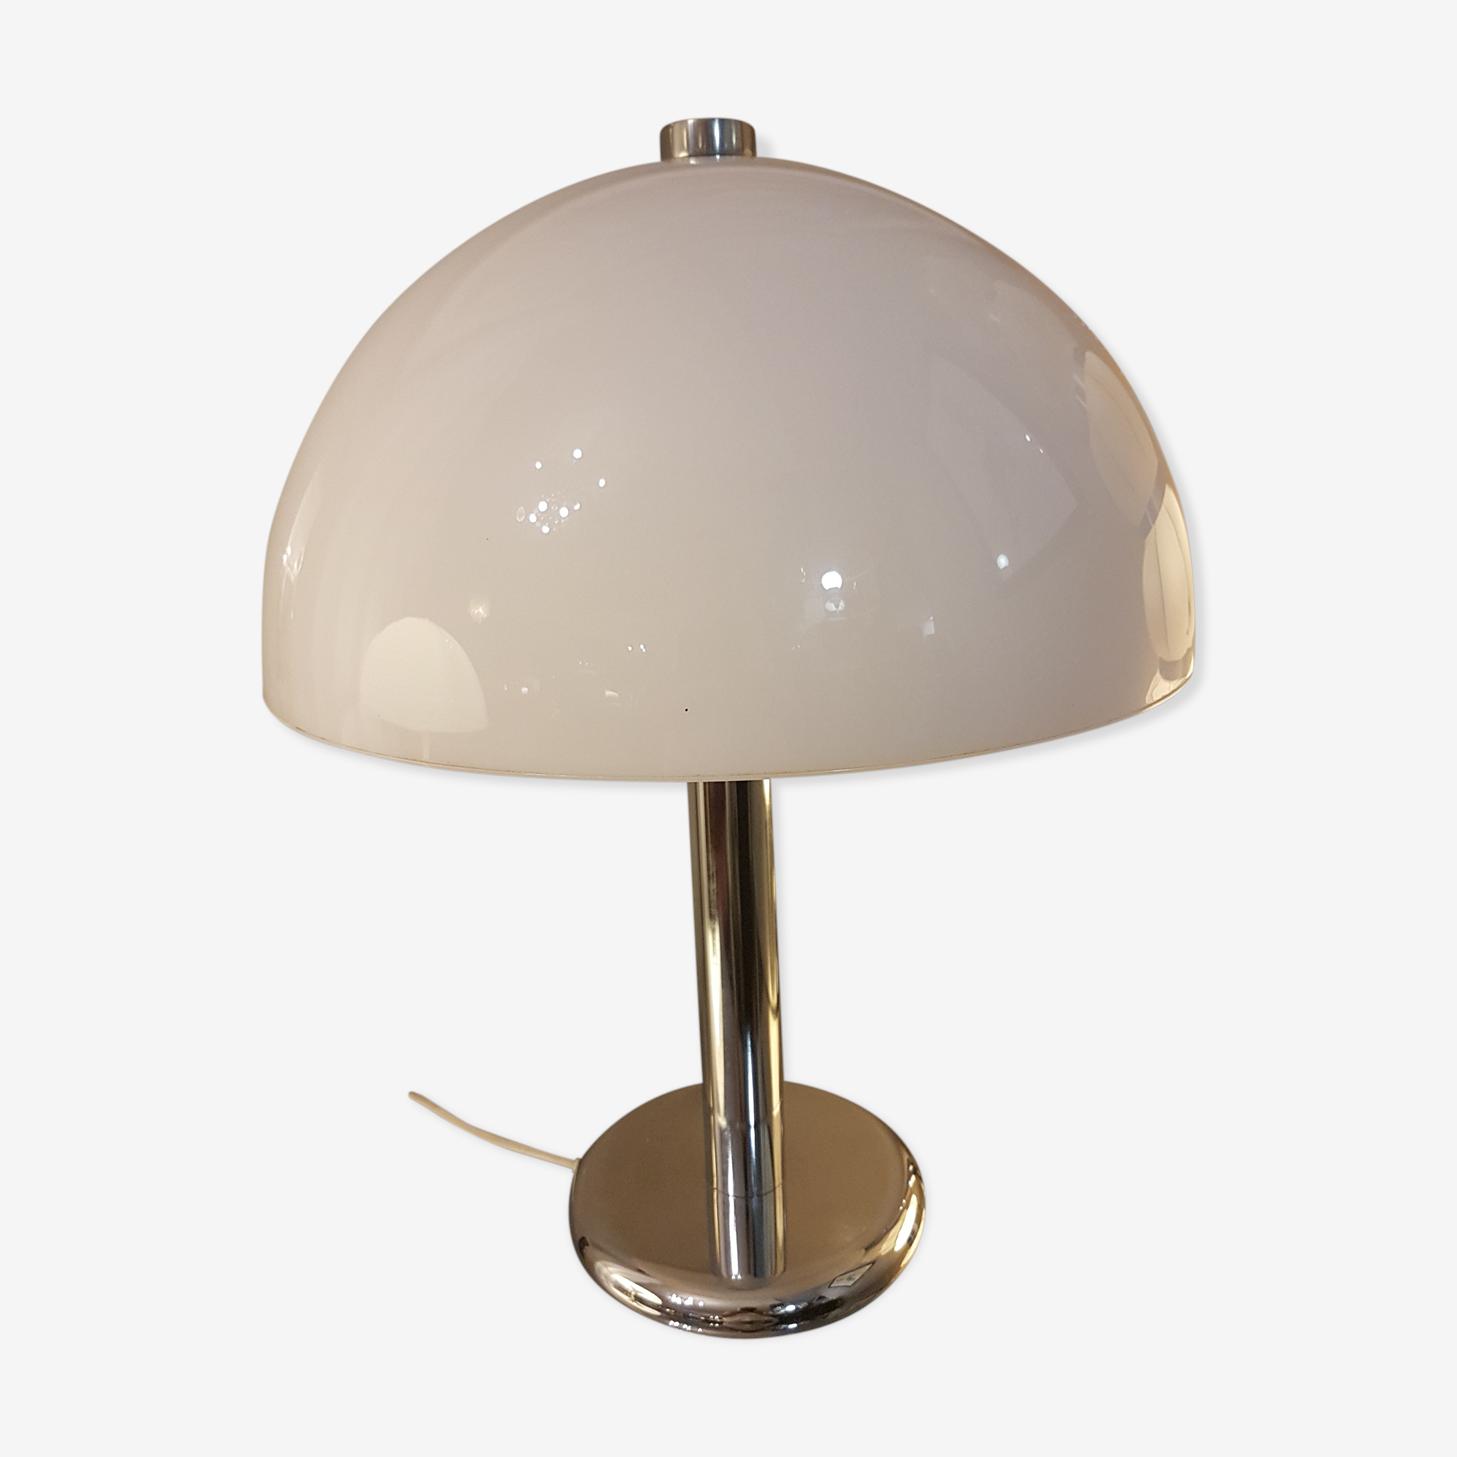 Lamp Guzzini 1970 Metal White Design L9oyrv3